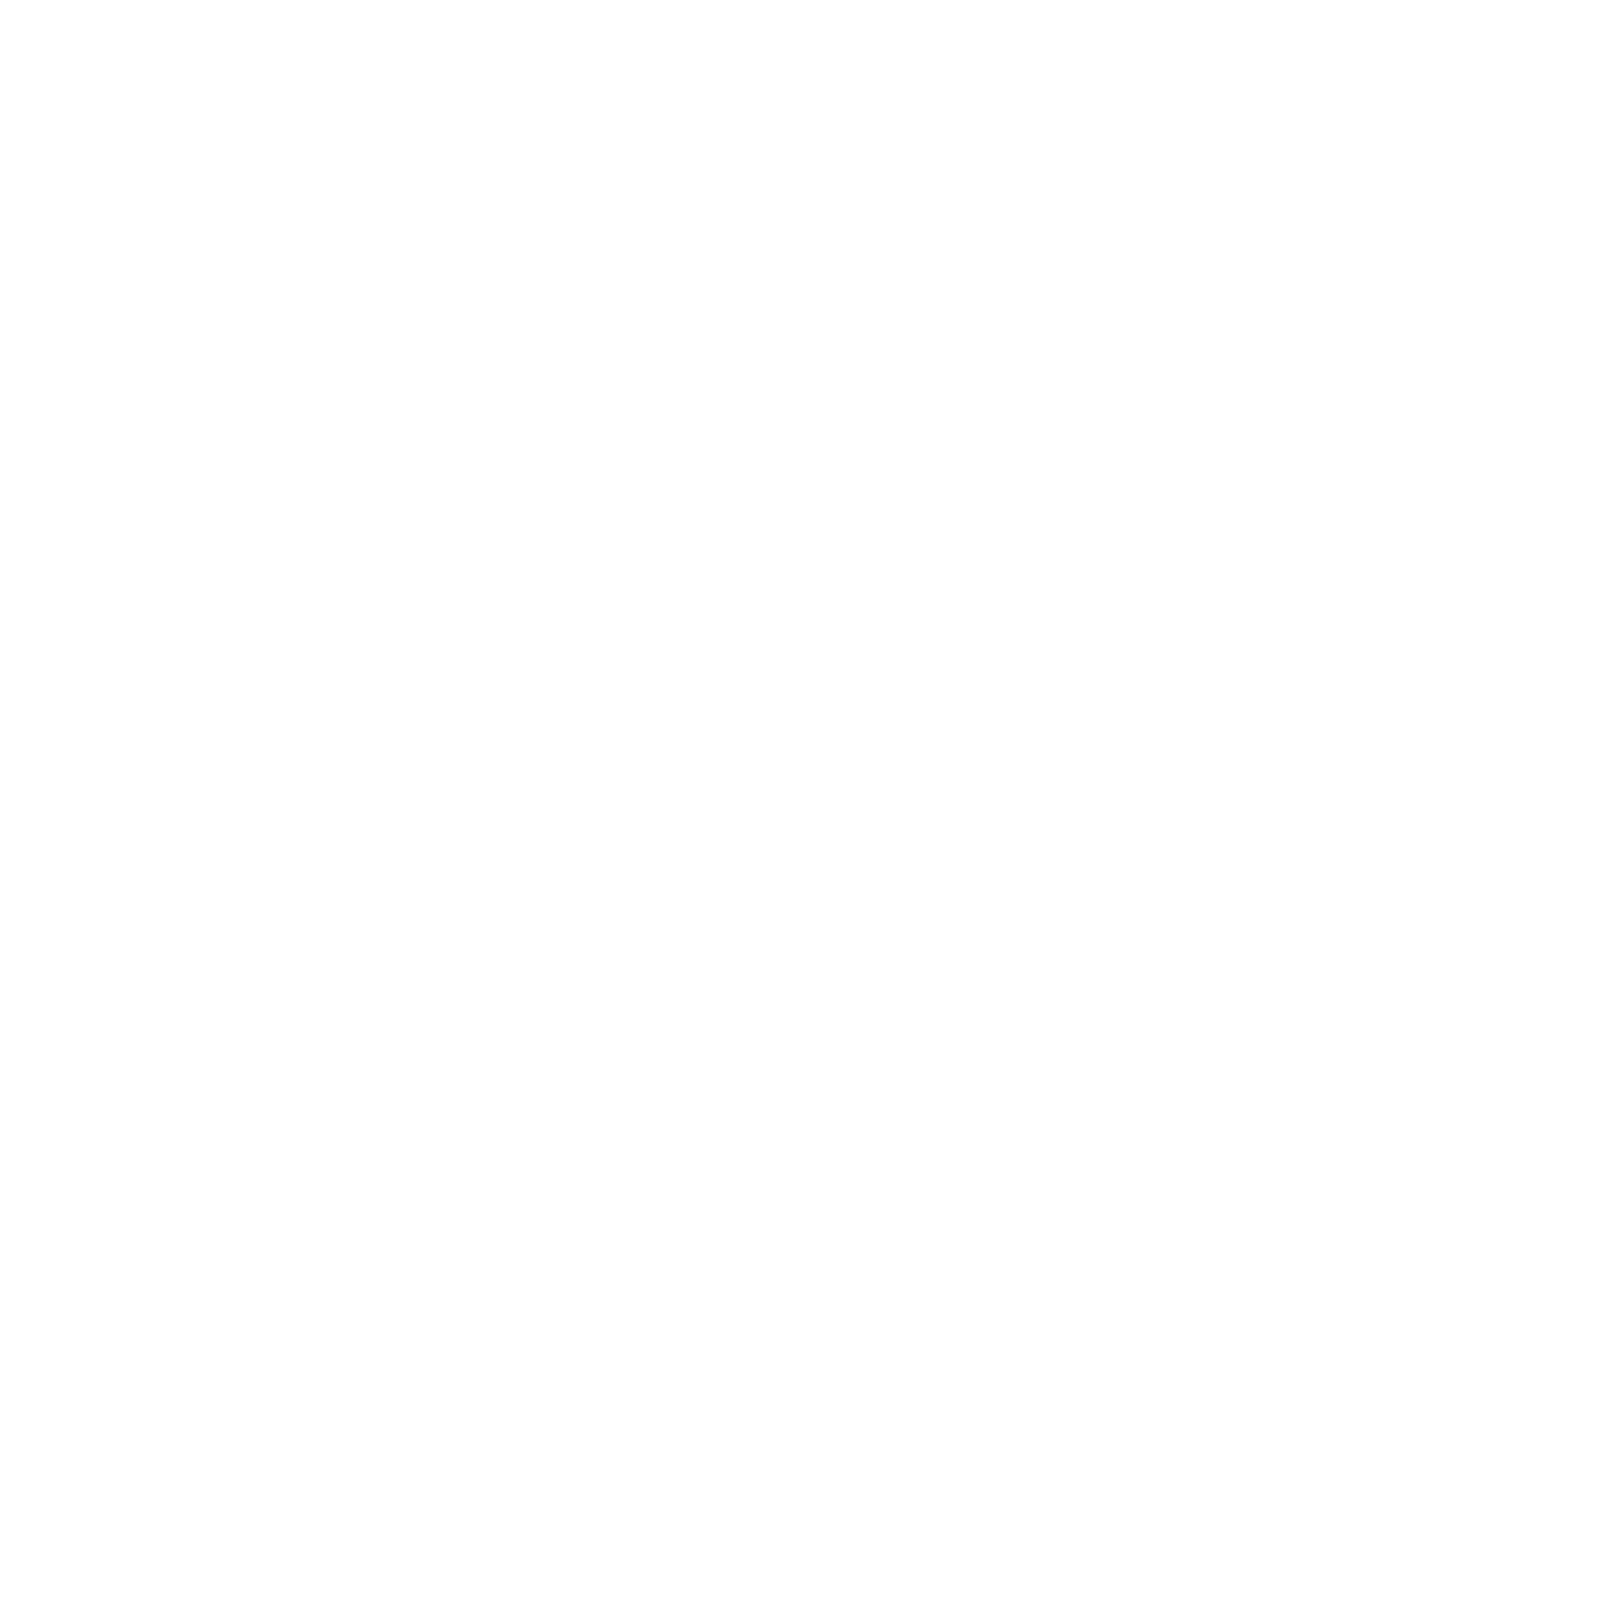 XYZ logo Mode Zero